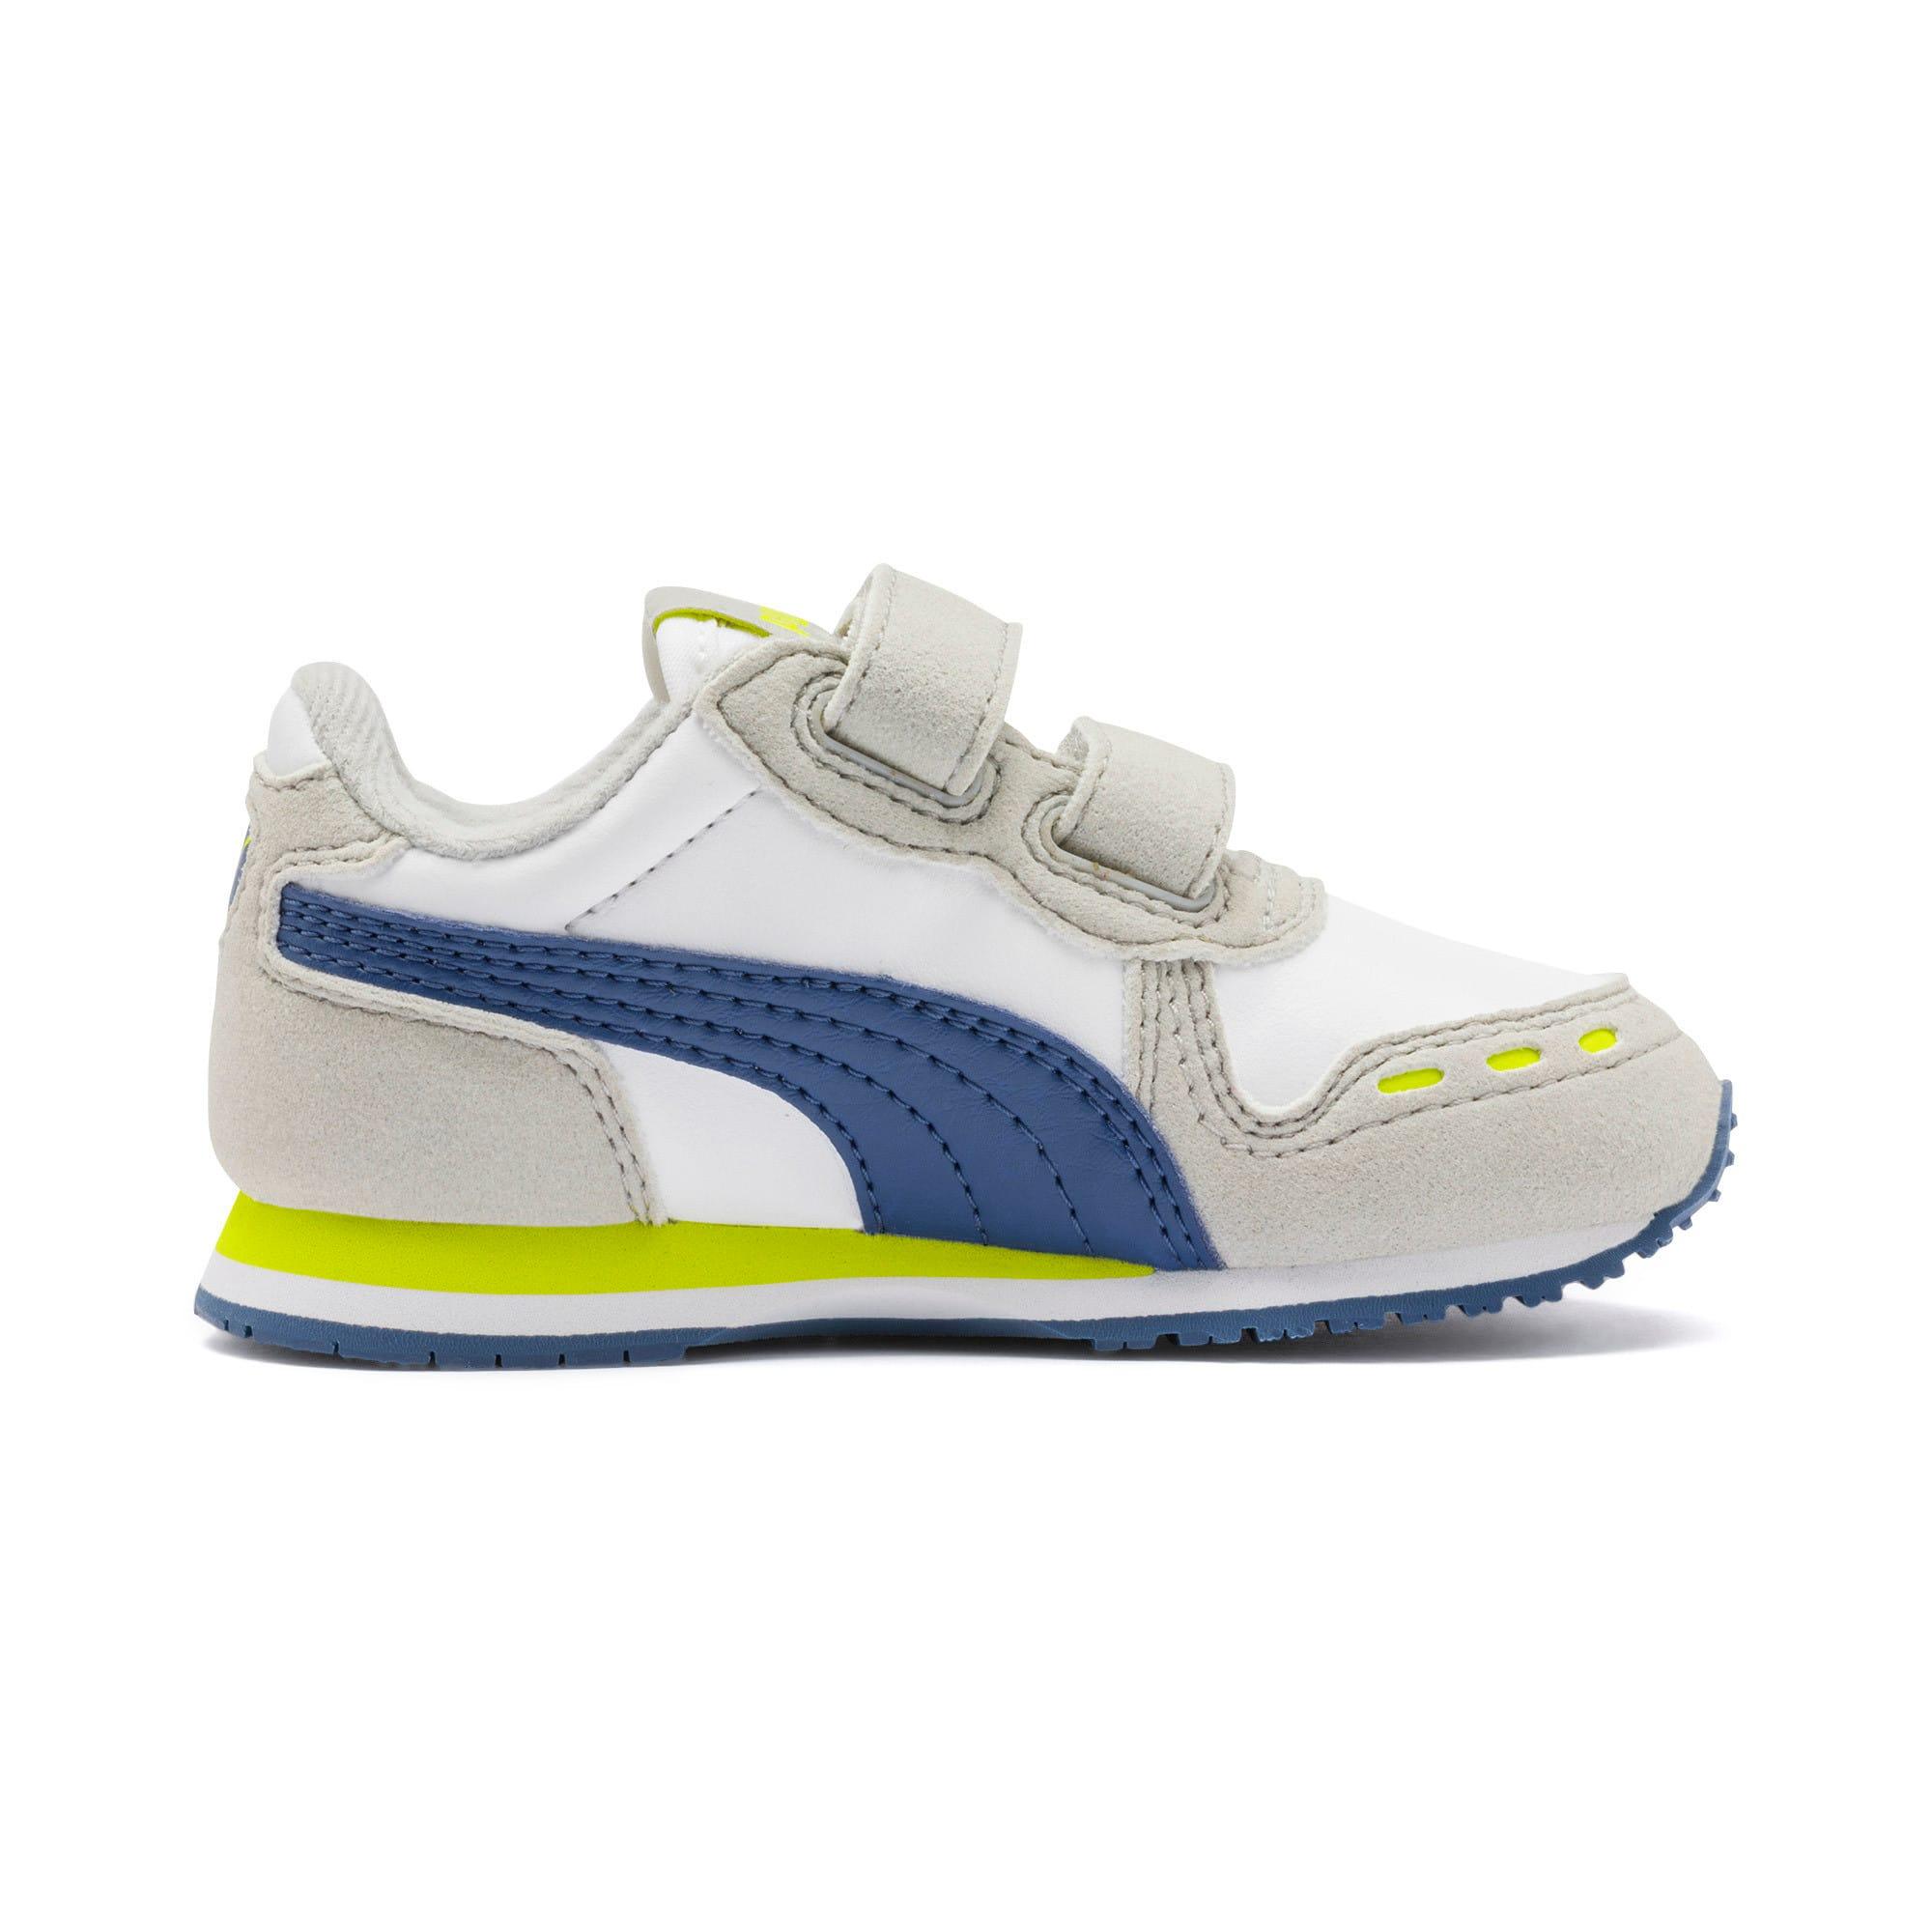 Thumbnail 5 of Cabana Racer SL Toddler Shoes, Puma White-Galaxy Blue, medium